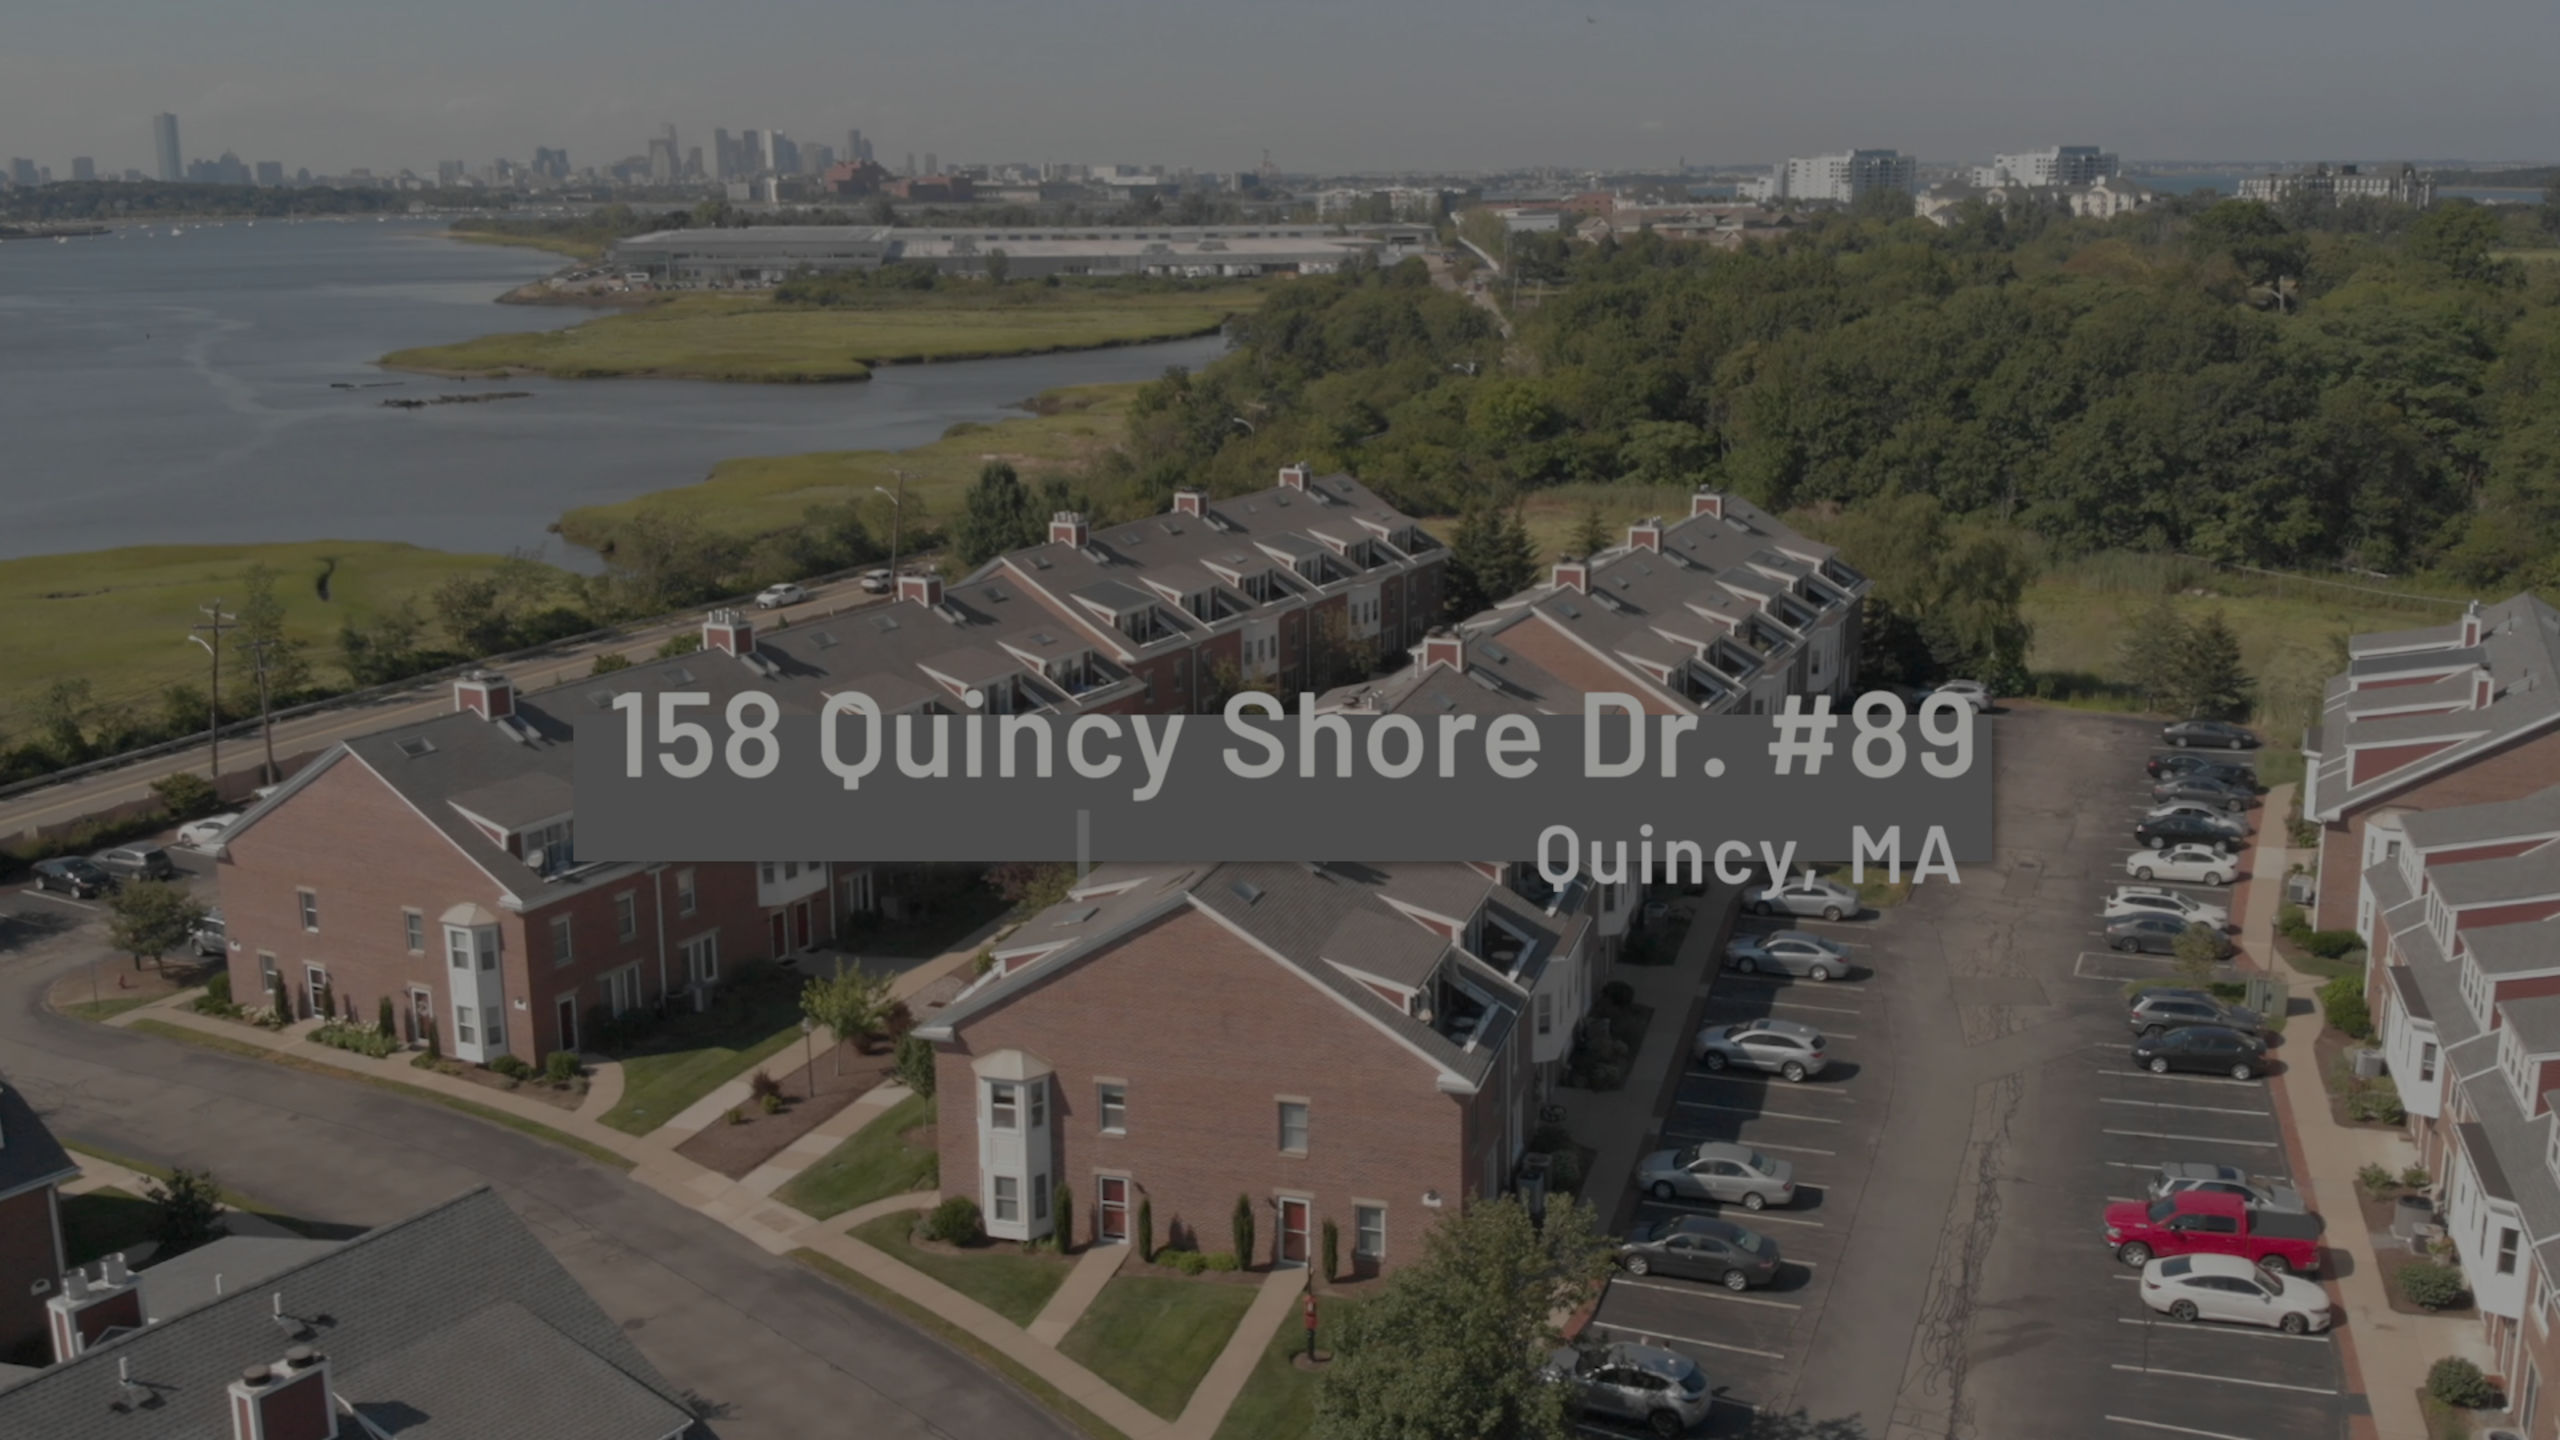 158 Quincy Shore Drive, Quincy, MA